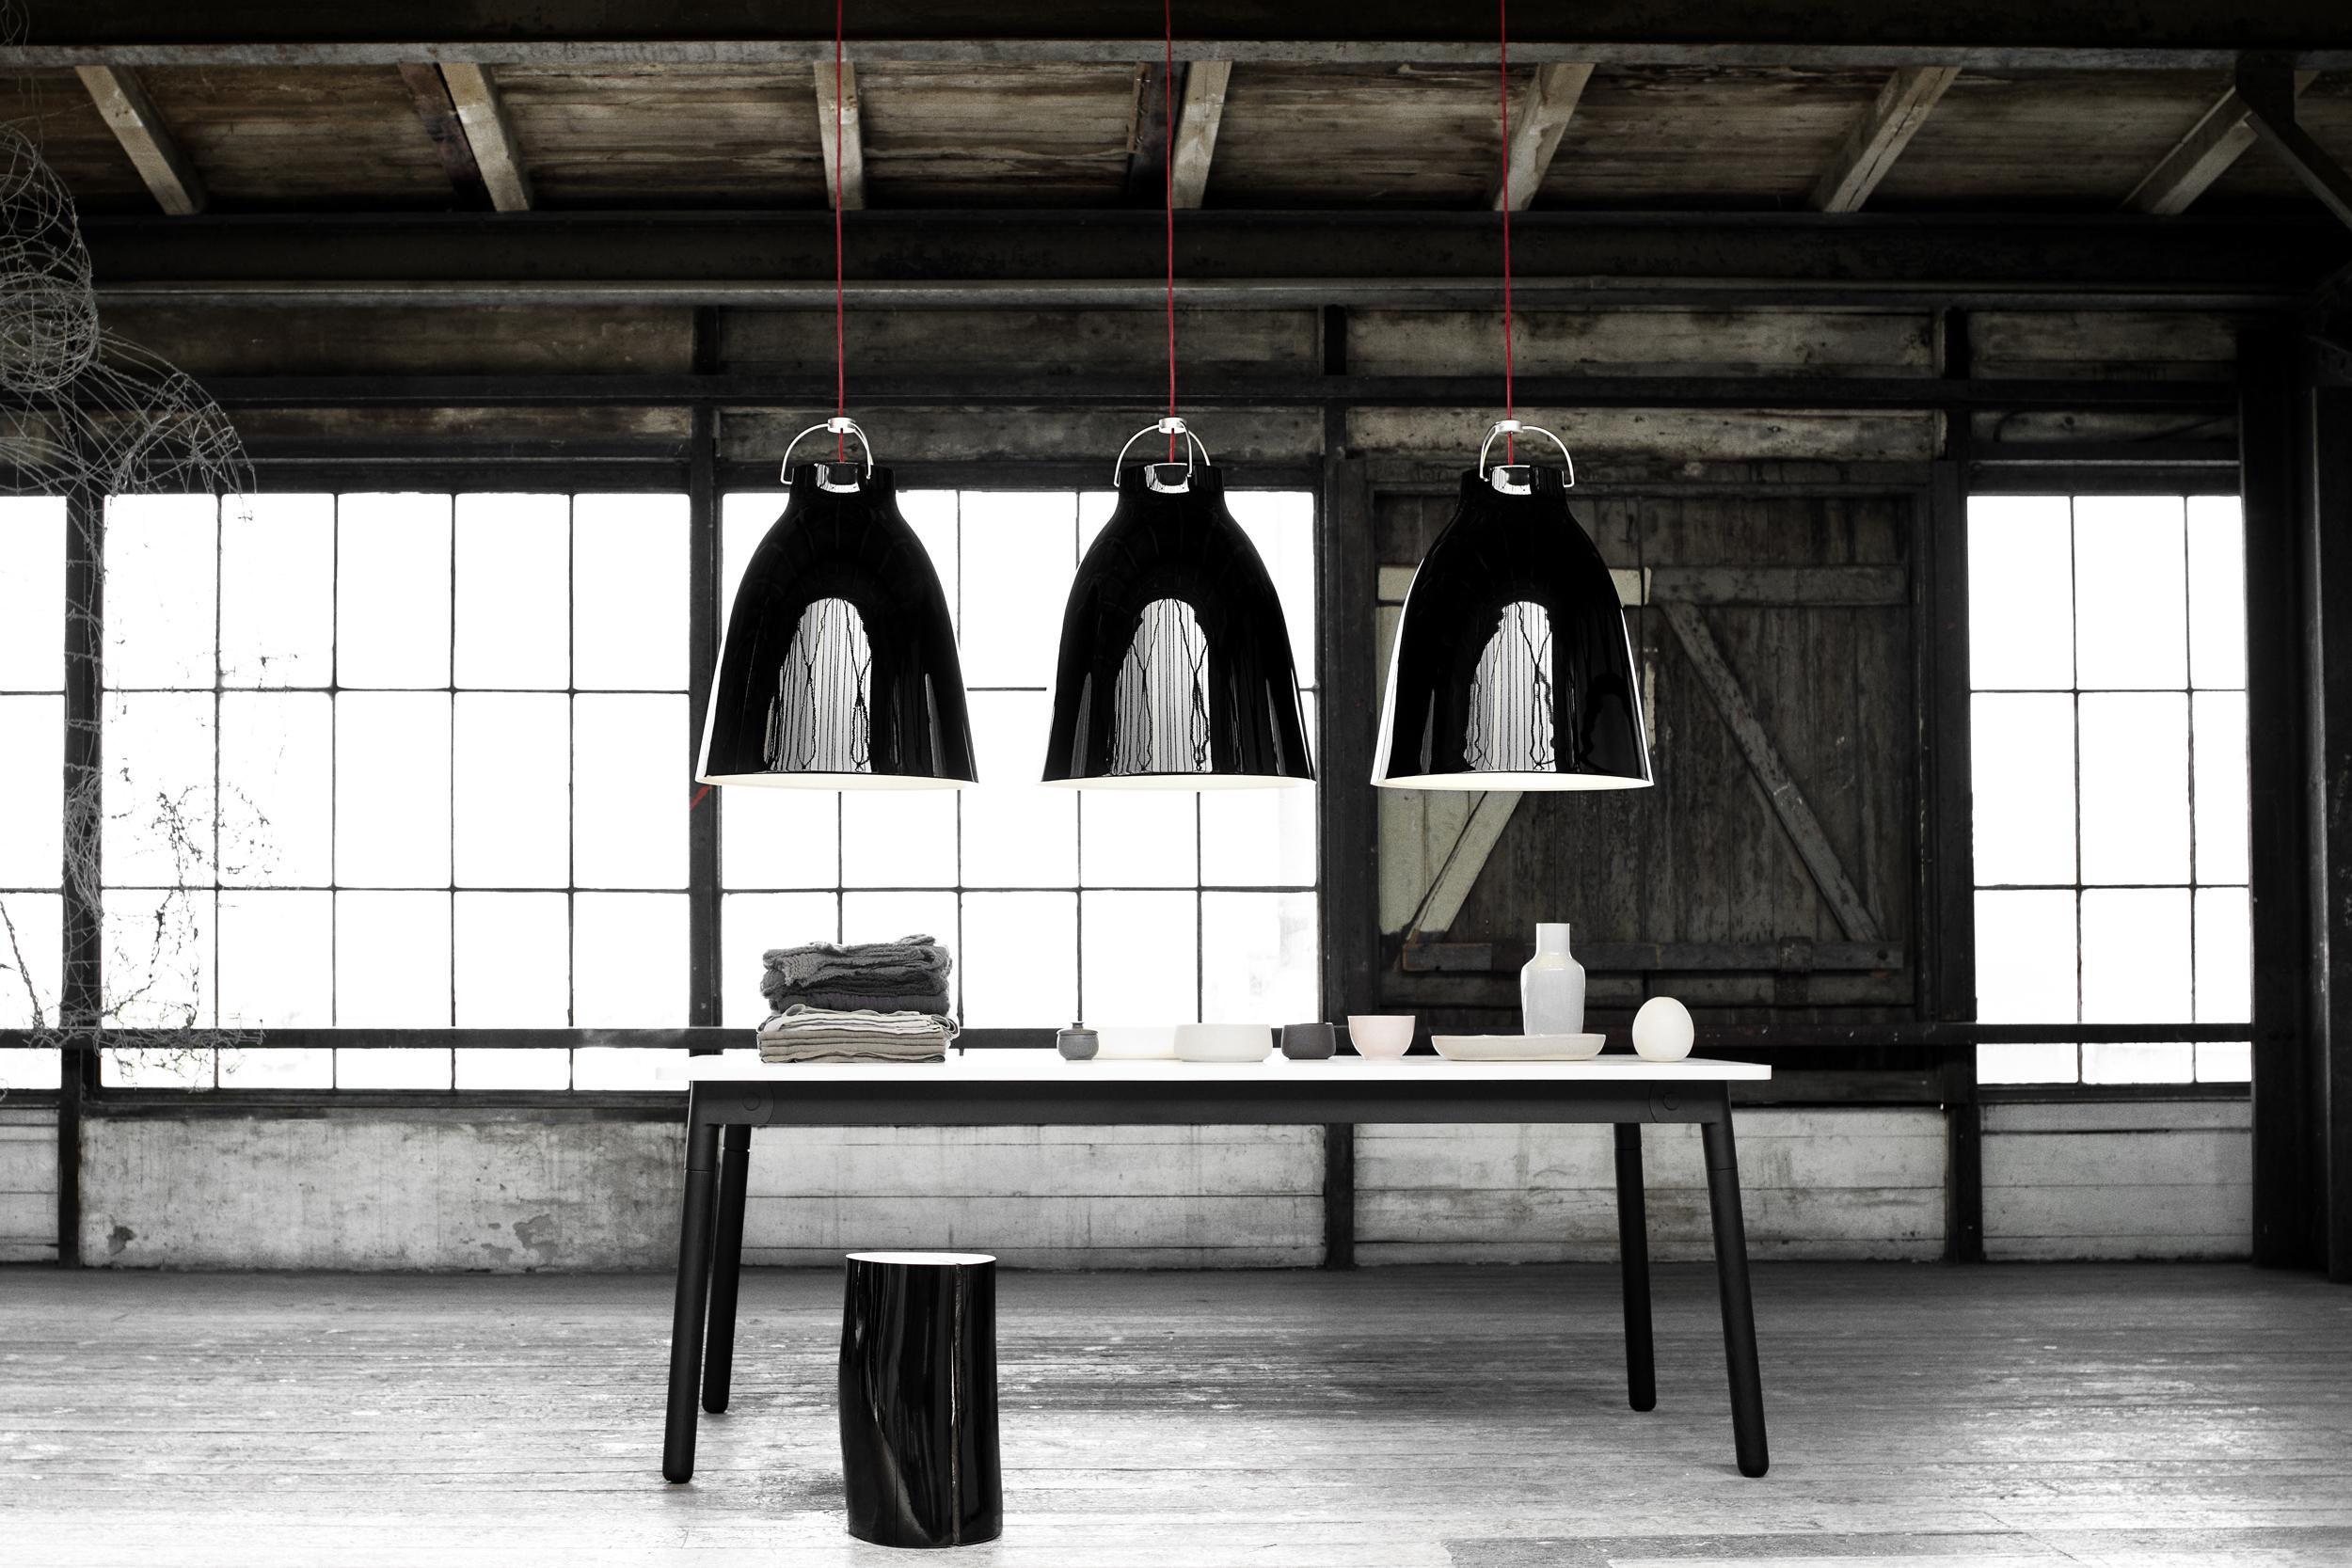 6814_Caravaggio P4 Black - Install. 40101 - 300dpi.jpg.jpg